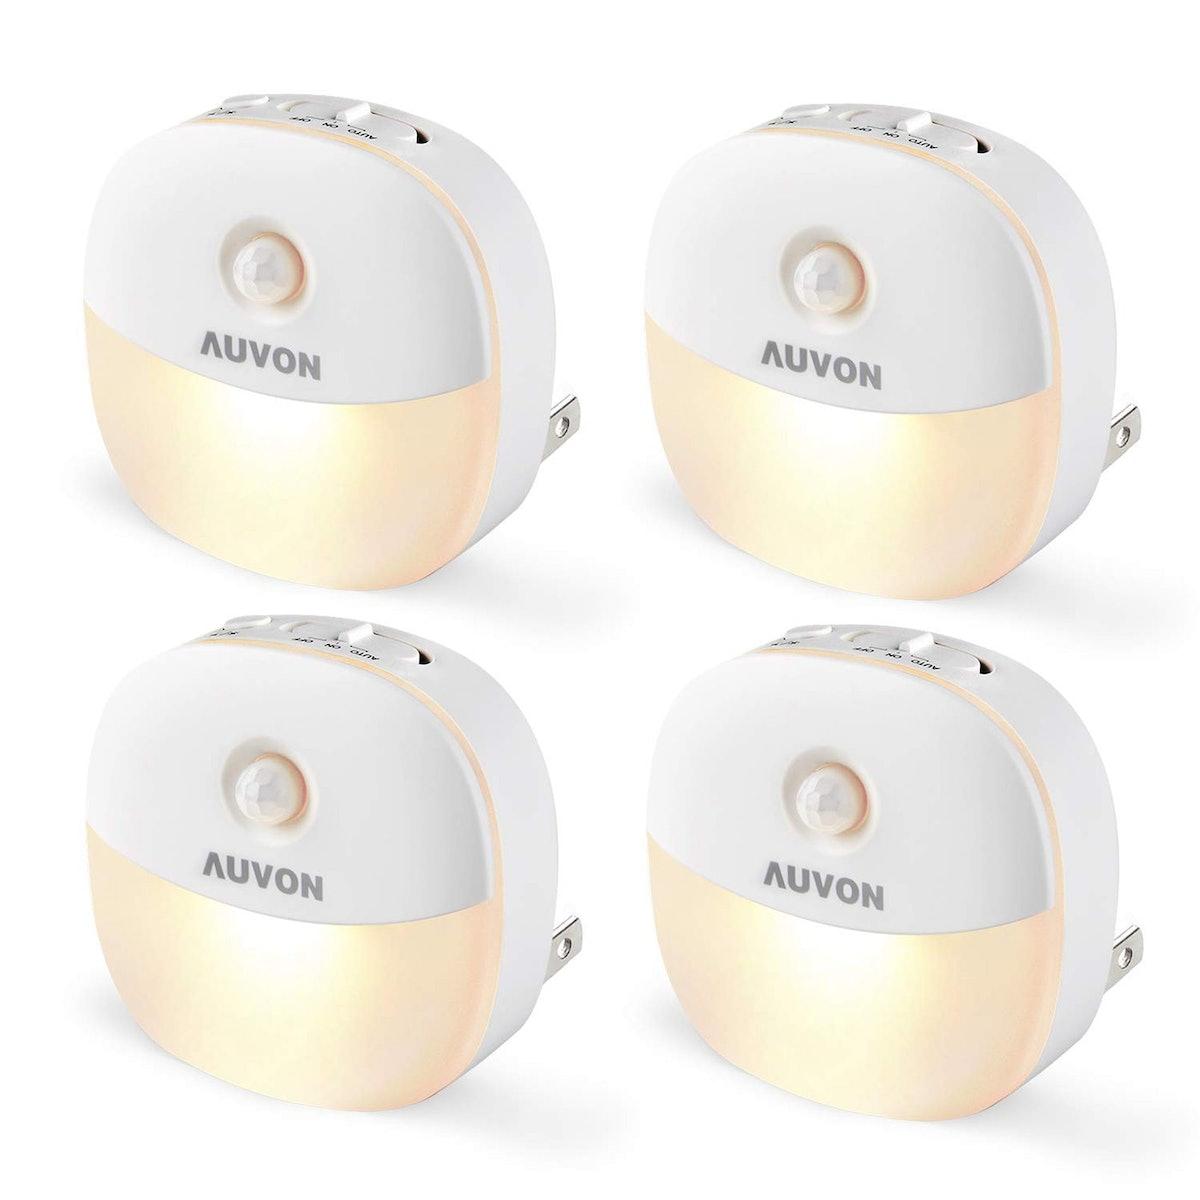 AUVON Plug-In LED Motion Sensor Night Light (4 Pack)